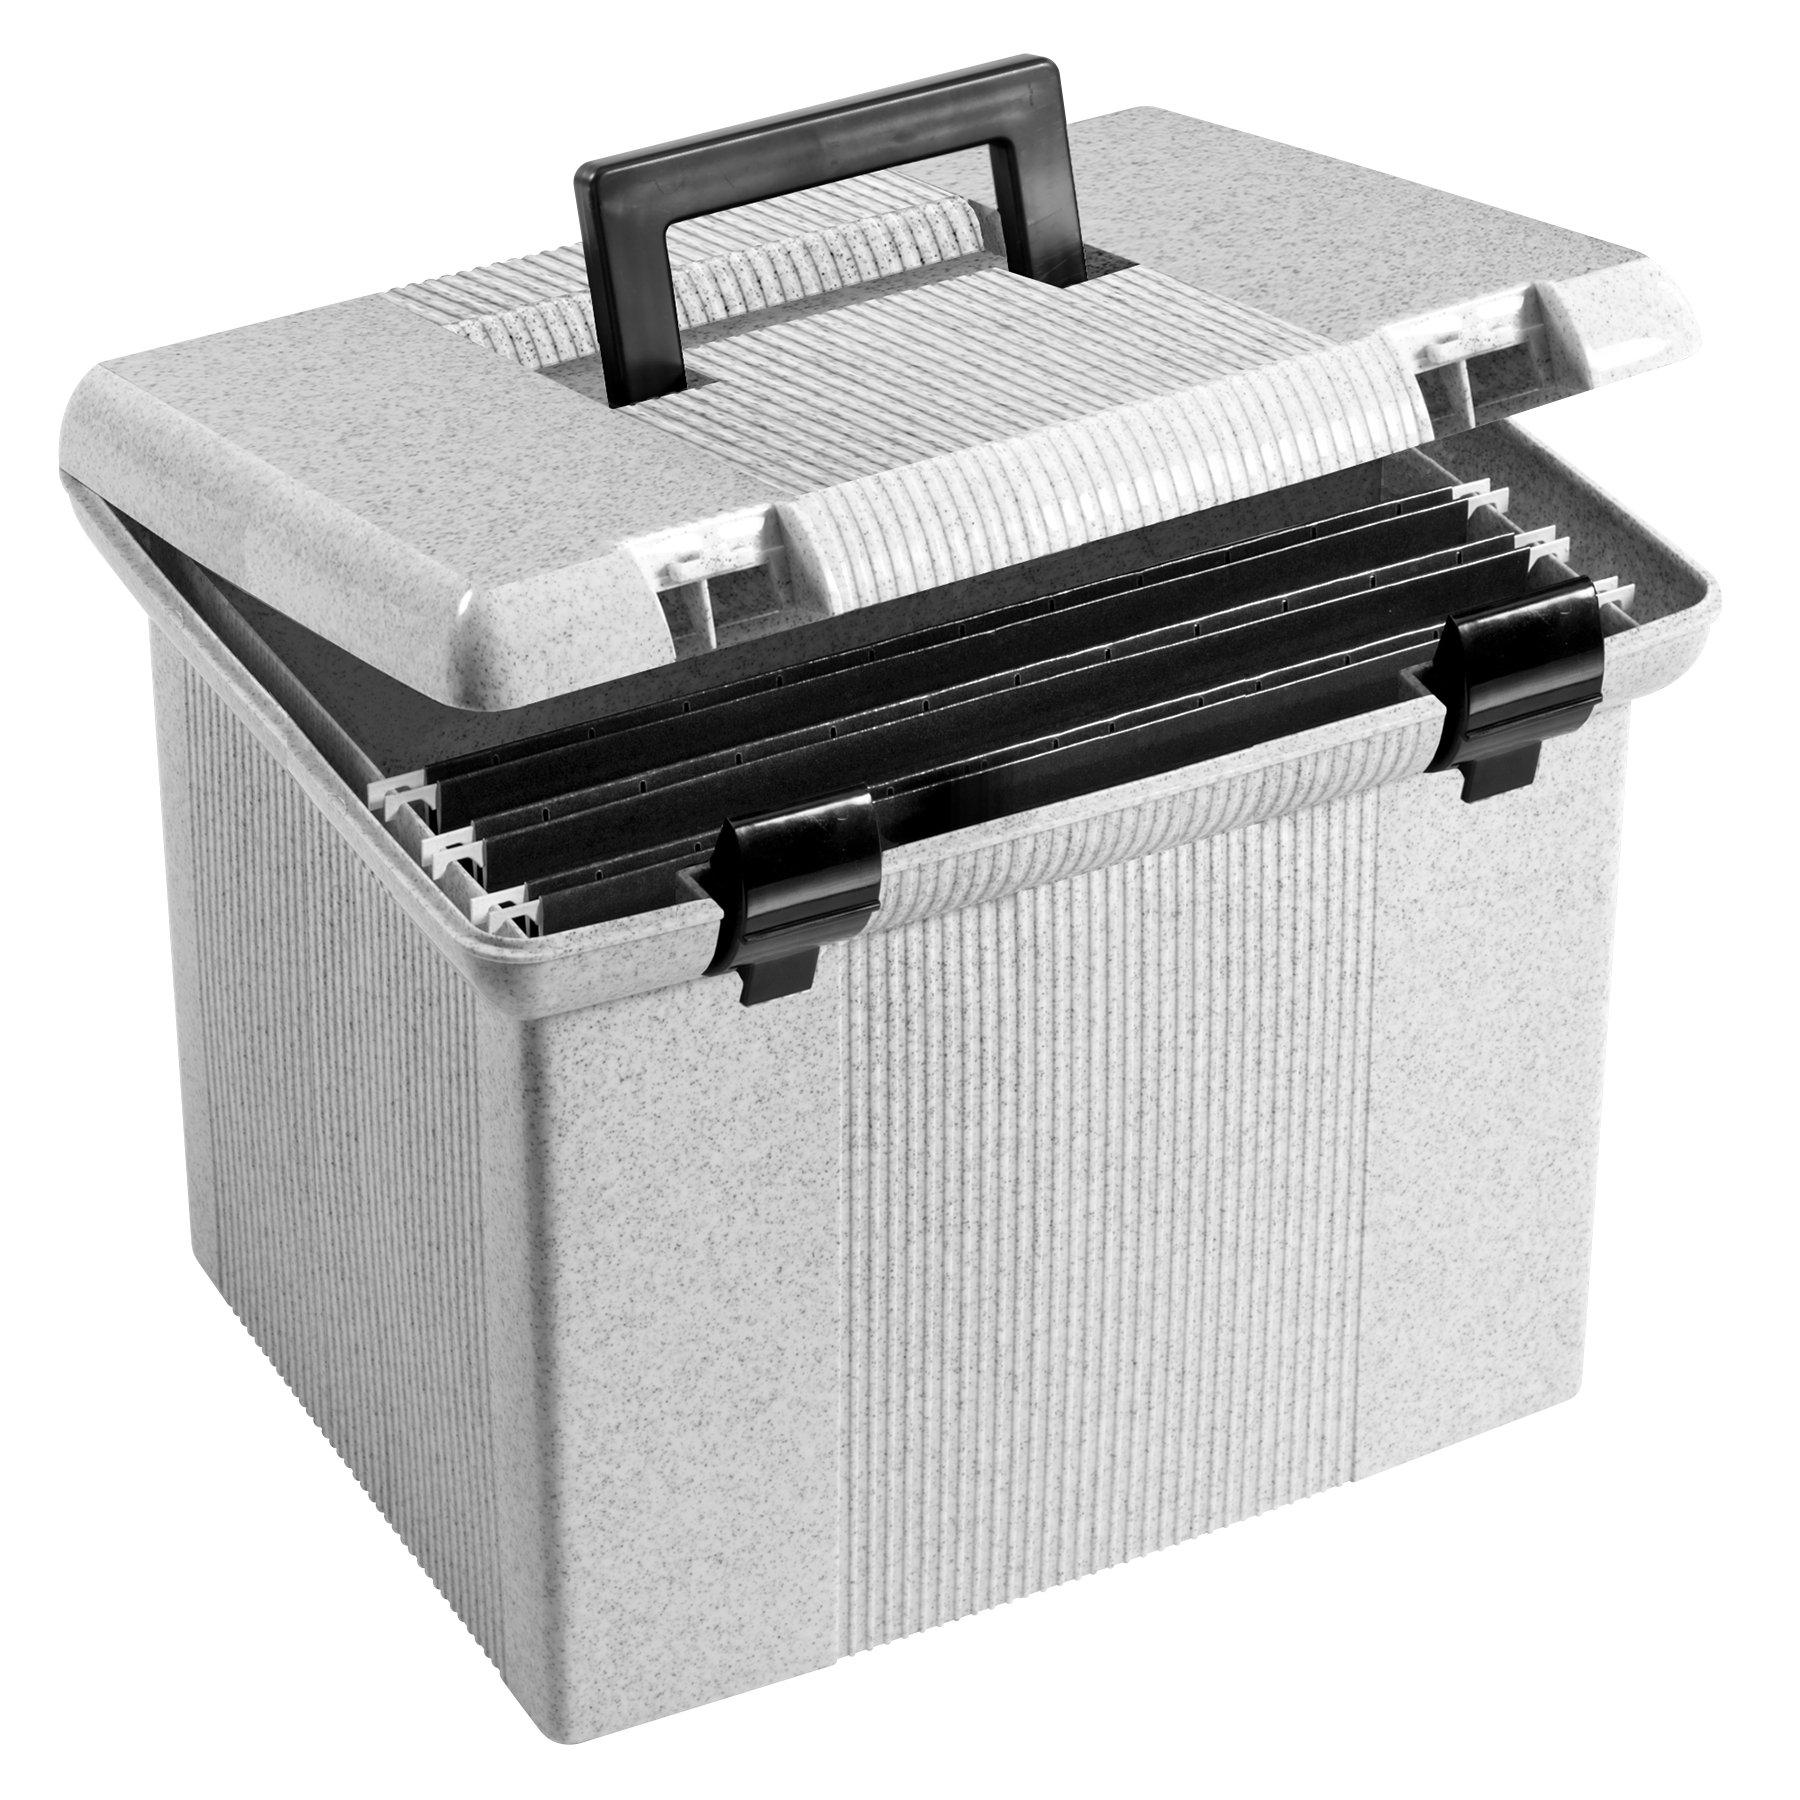 Pendaflex Portable File Box, 11''H x 14'' W x 11 1/8'' D, Granite (41747) by Pendaflex